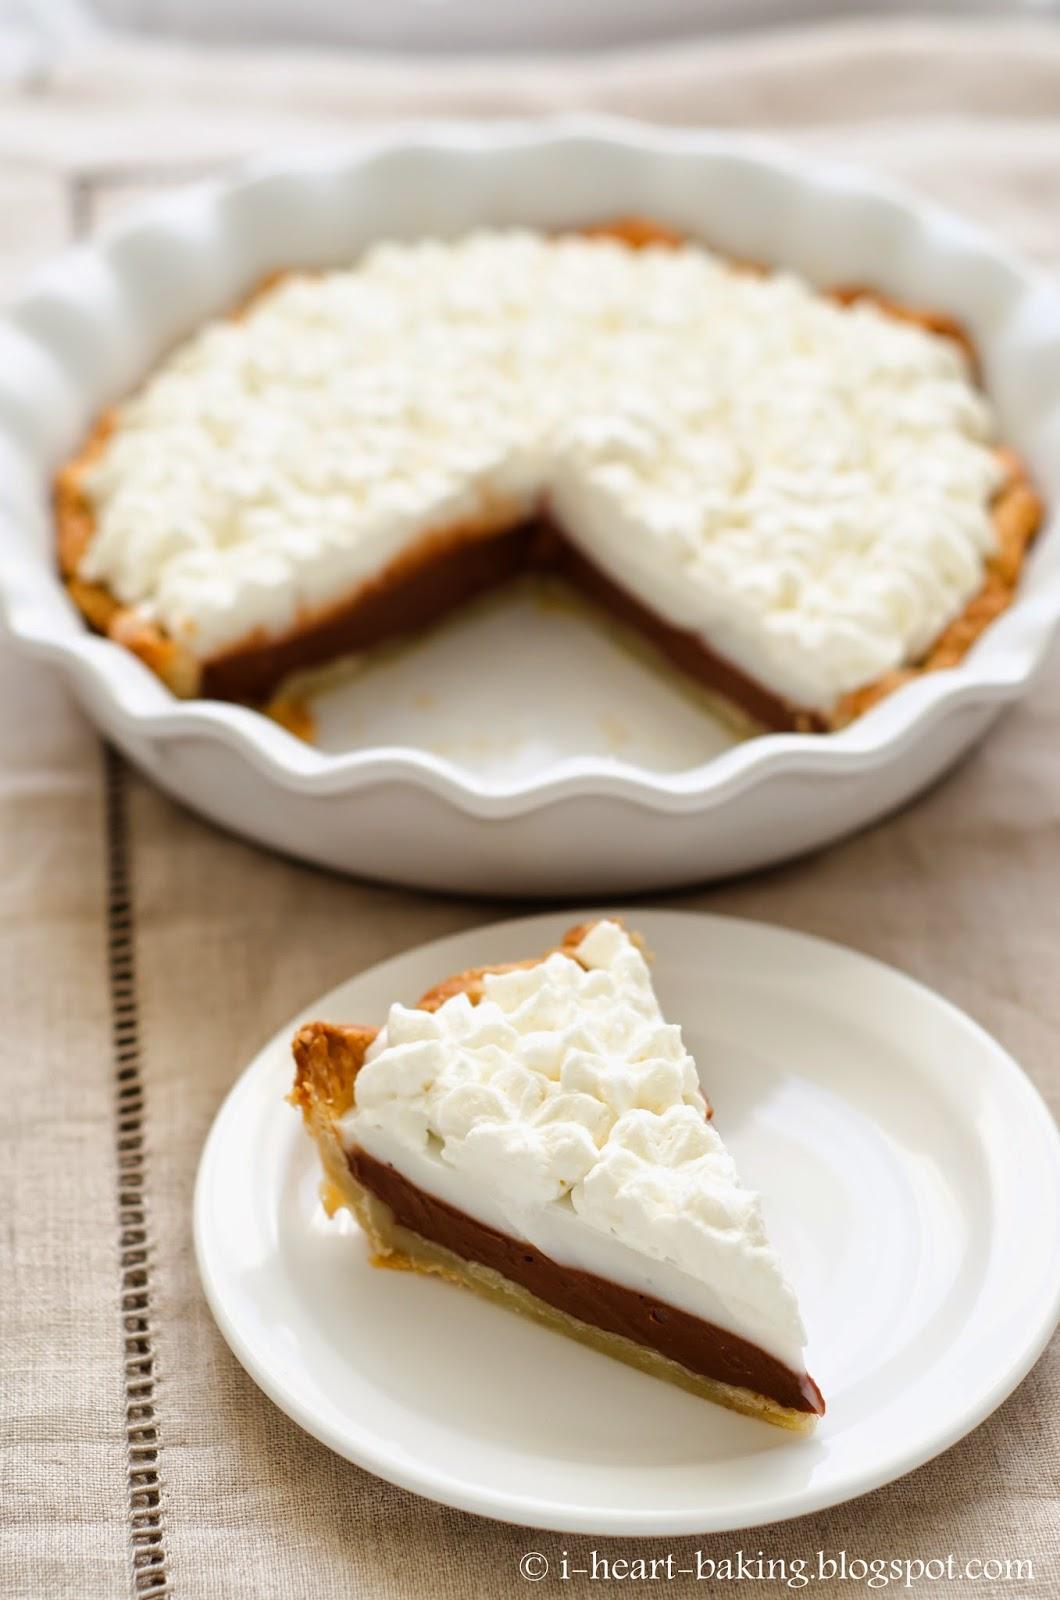 heart baking!: chocolate haupia pie